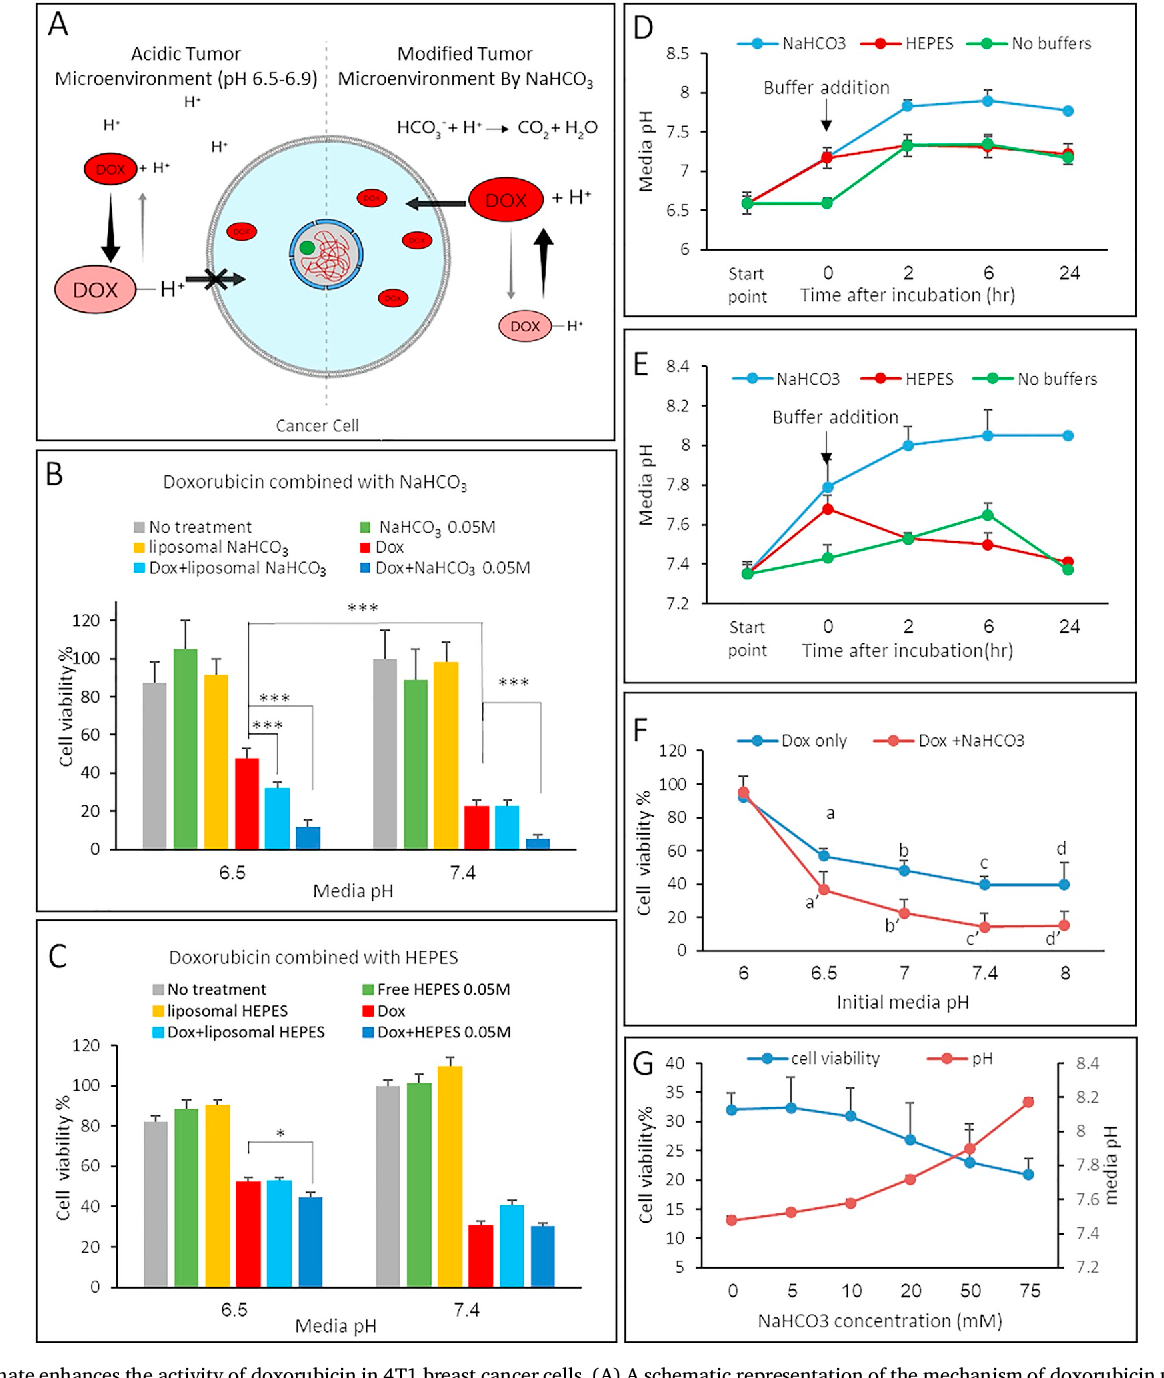 Sodium bicarbonate nanoparticles modulate the tumor pH and